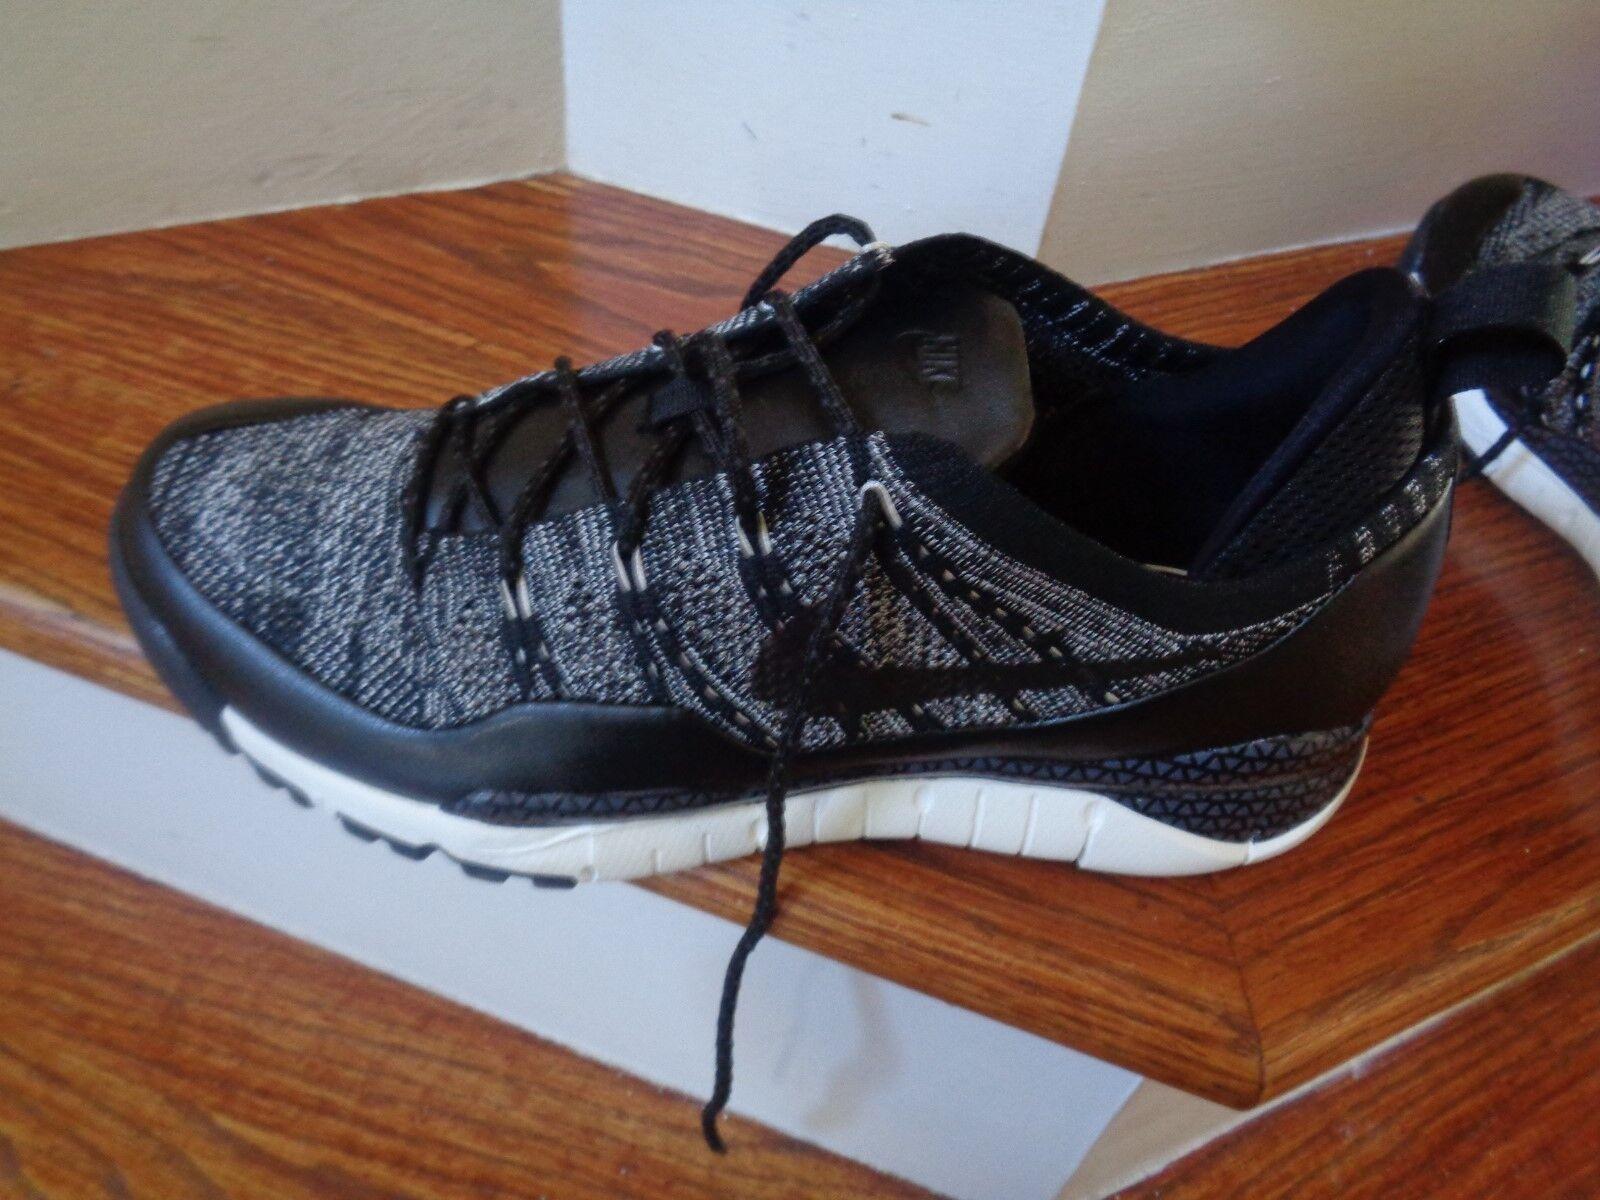 Nike Lupinek Flyknit Uomo Basketball Shoes, 882685 100 Size Size Size 11 NEW c6604a